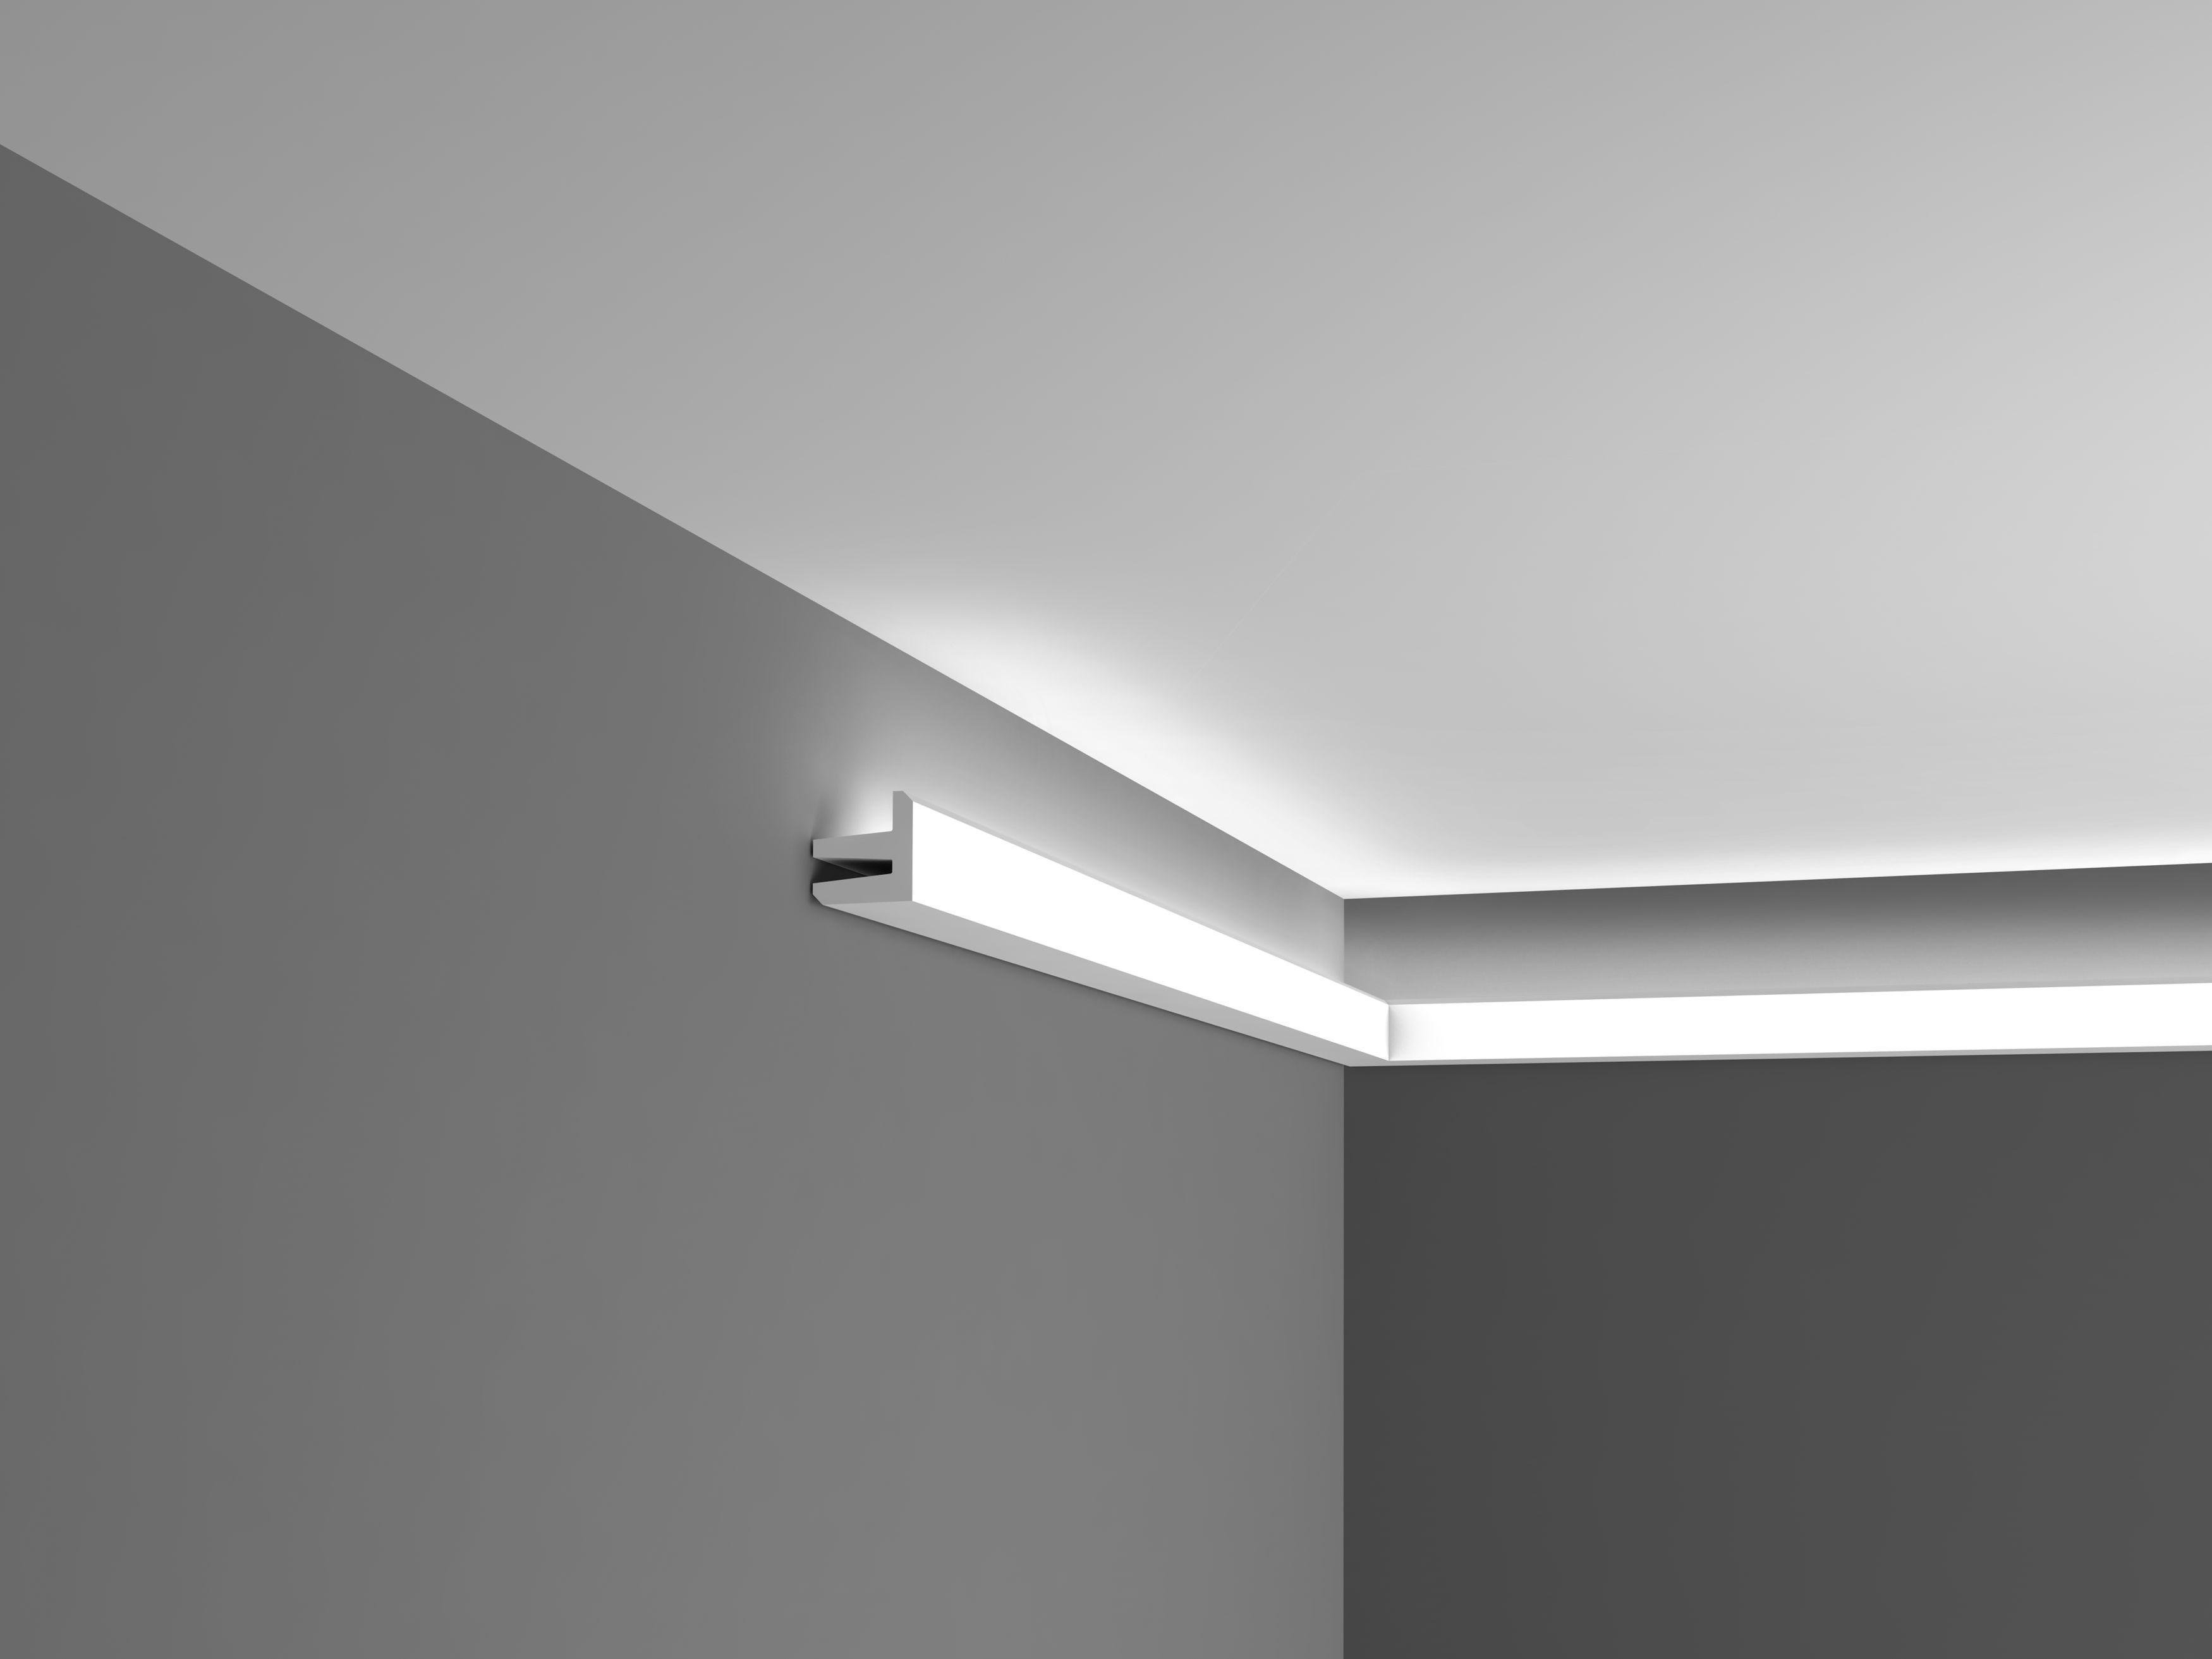 Corniche Polystyrène Pour Led c380 corniche plafond orac decor -luxxus - 5x5cm (h x p